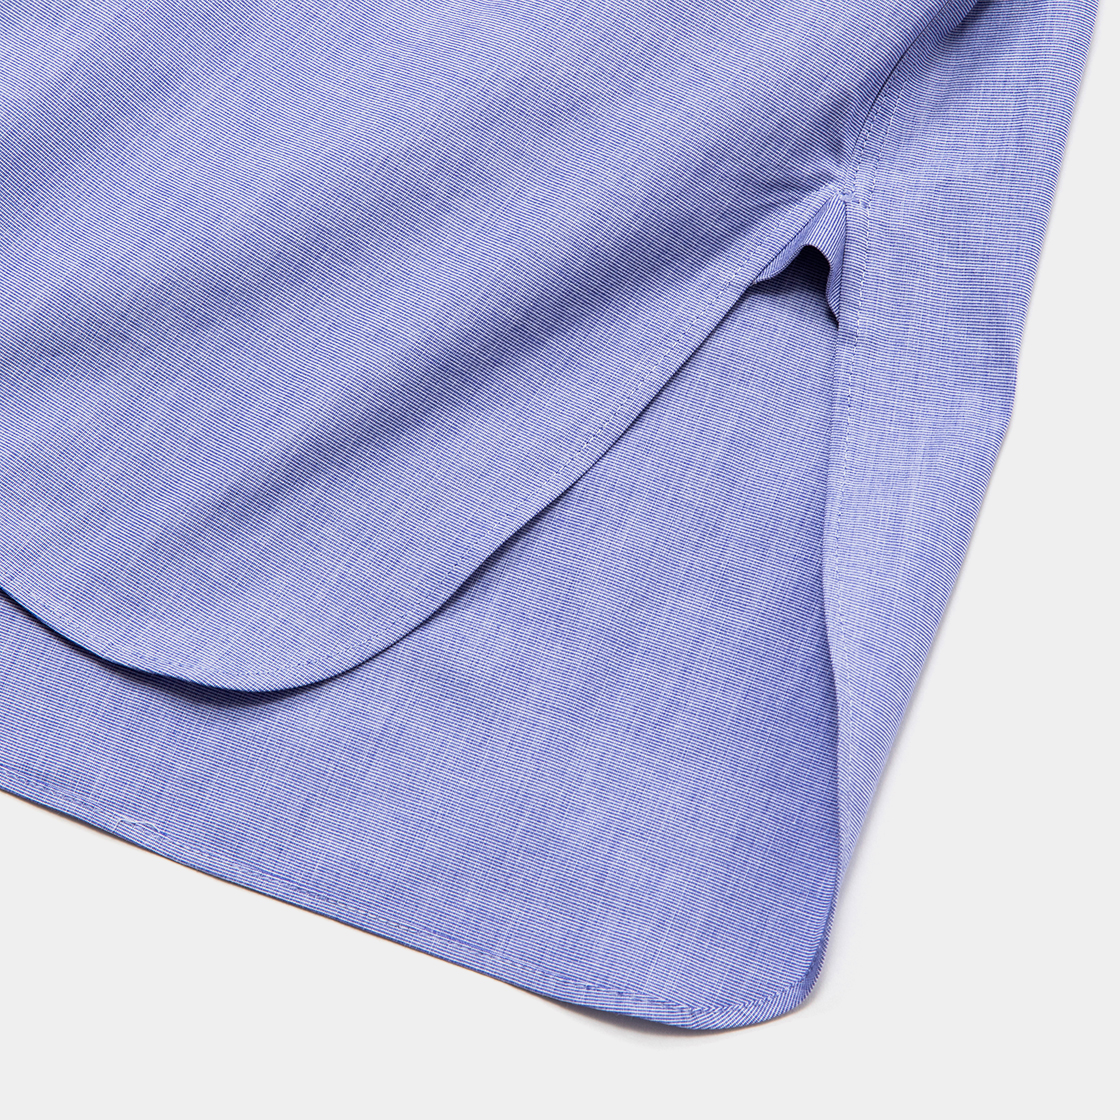 RAF Cloth Long SH / Sax